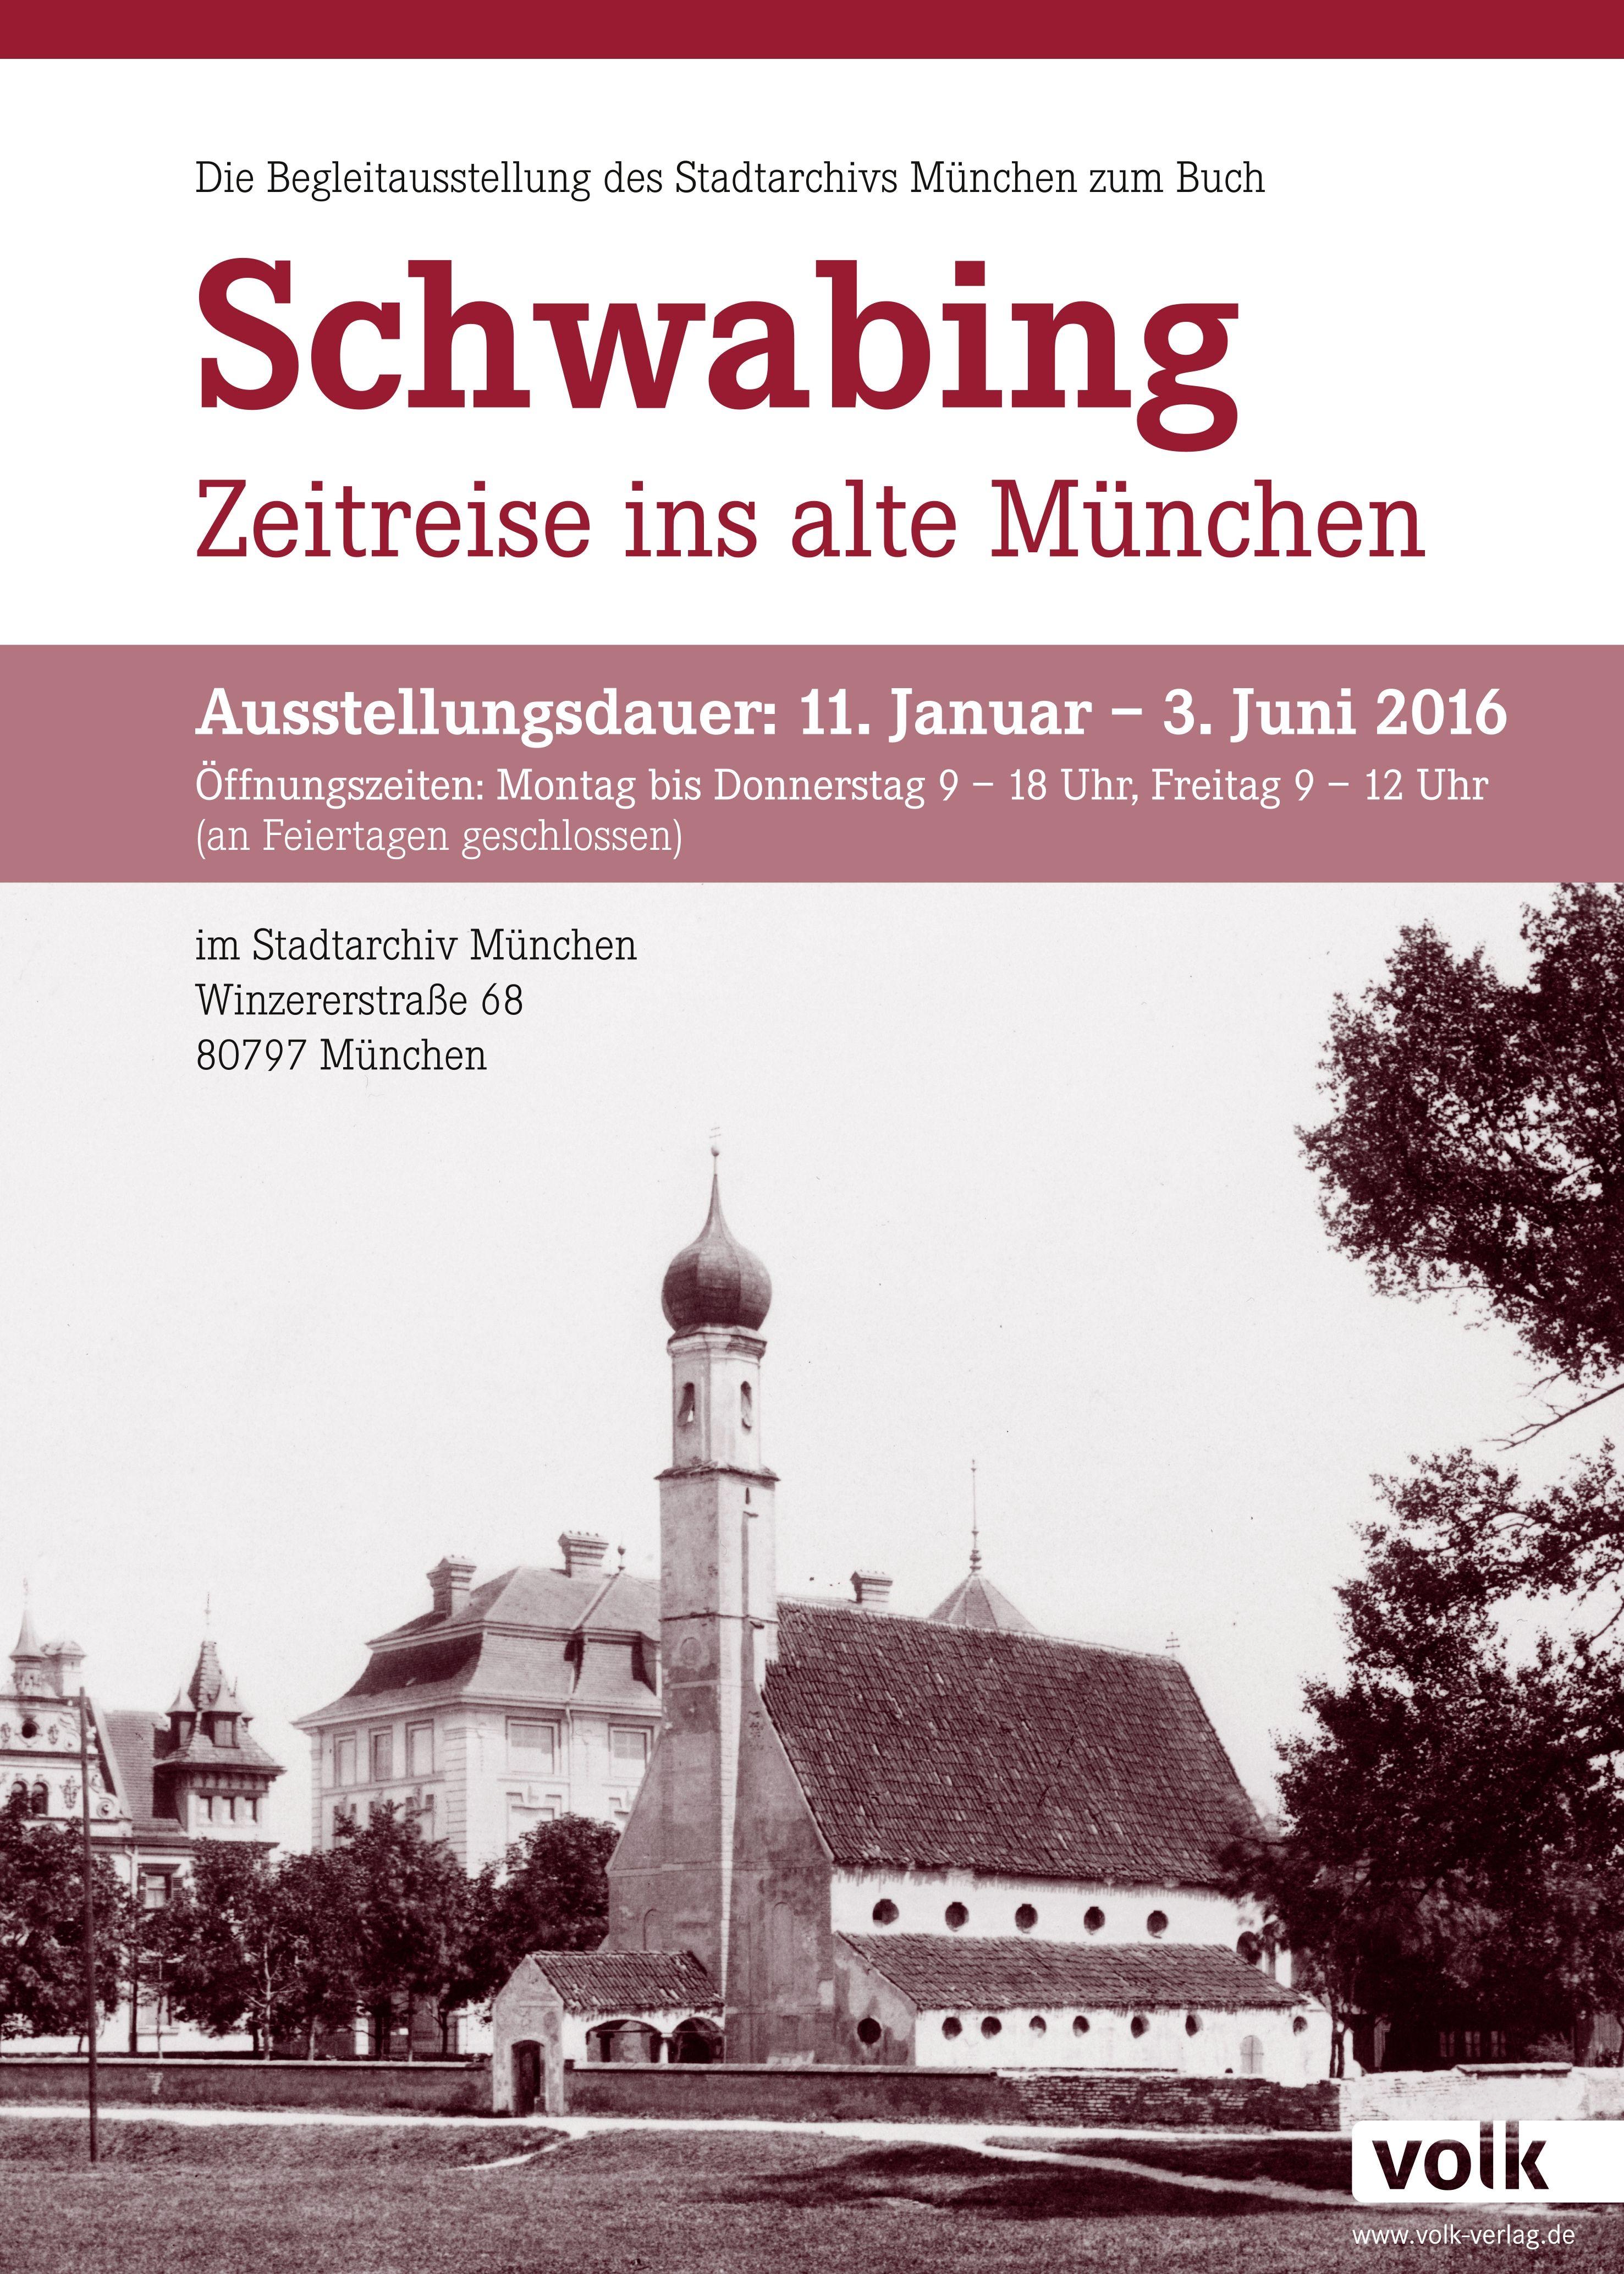 New Schwabing Erl serkirche postcard ca Altes M nchen Schwabing Pinterest Schwabing M nchen und Alter